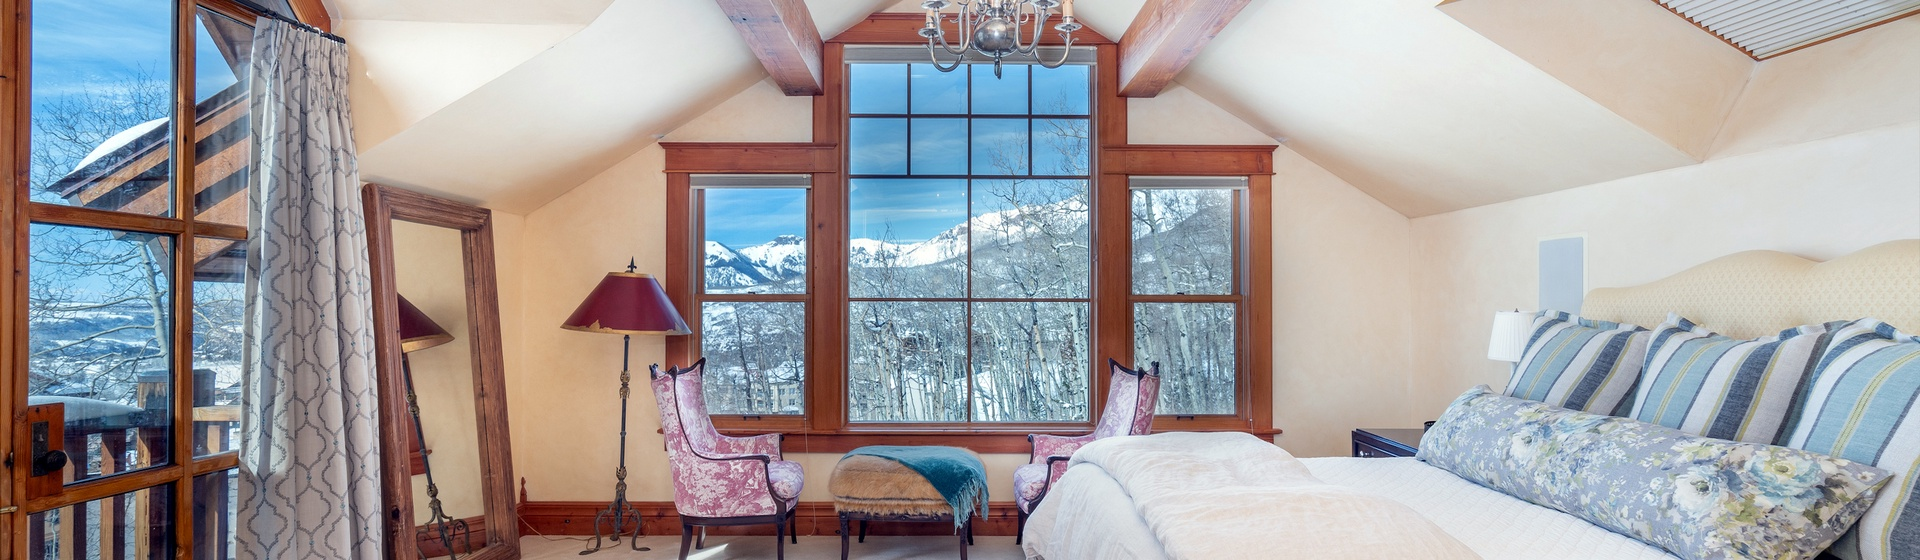 8-MountainVillage-Positive-Outlook-Master-Bedroom-Web.jpg